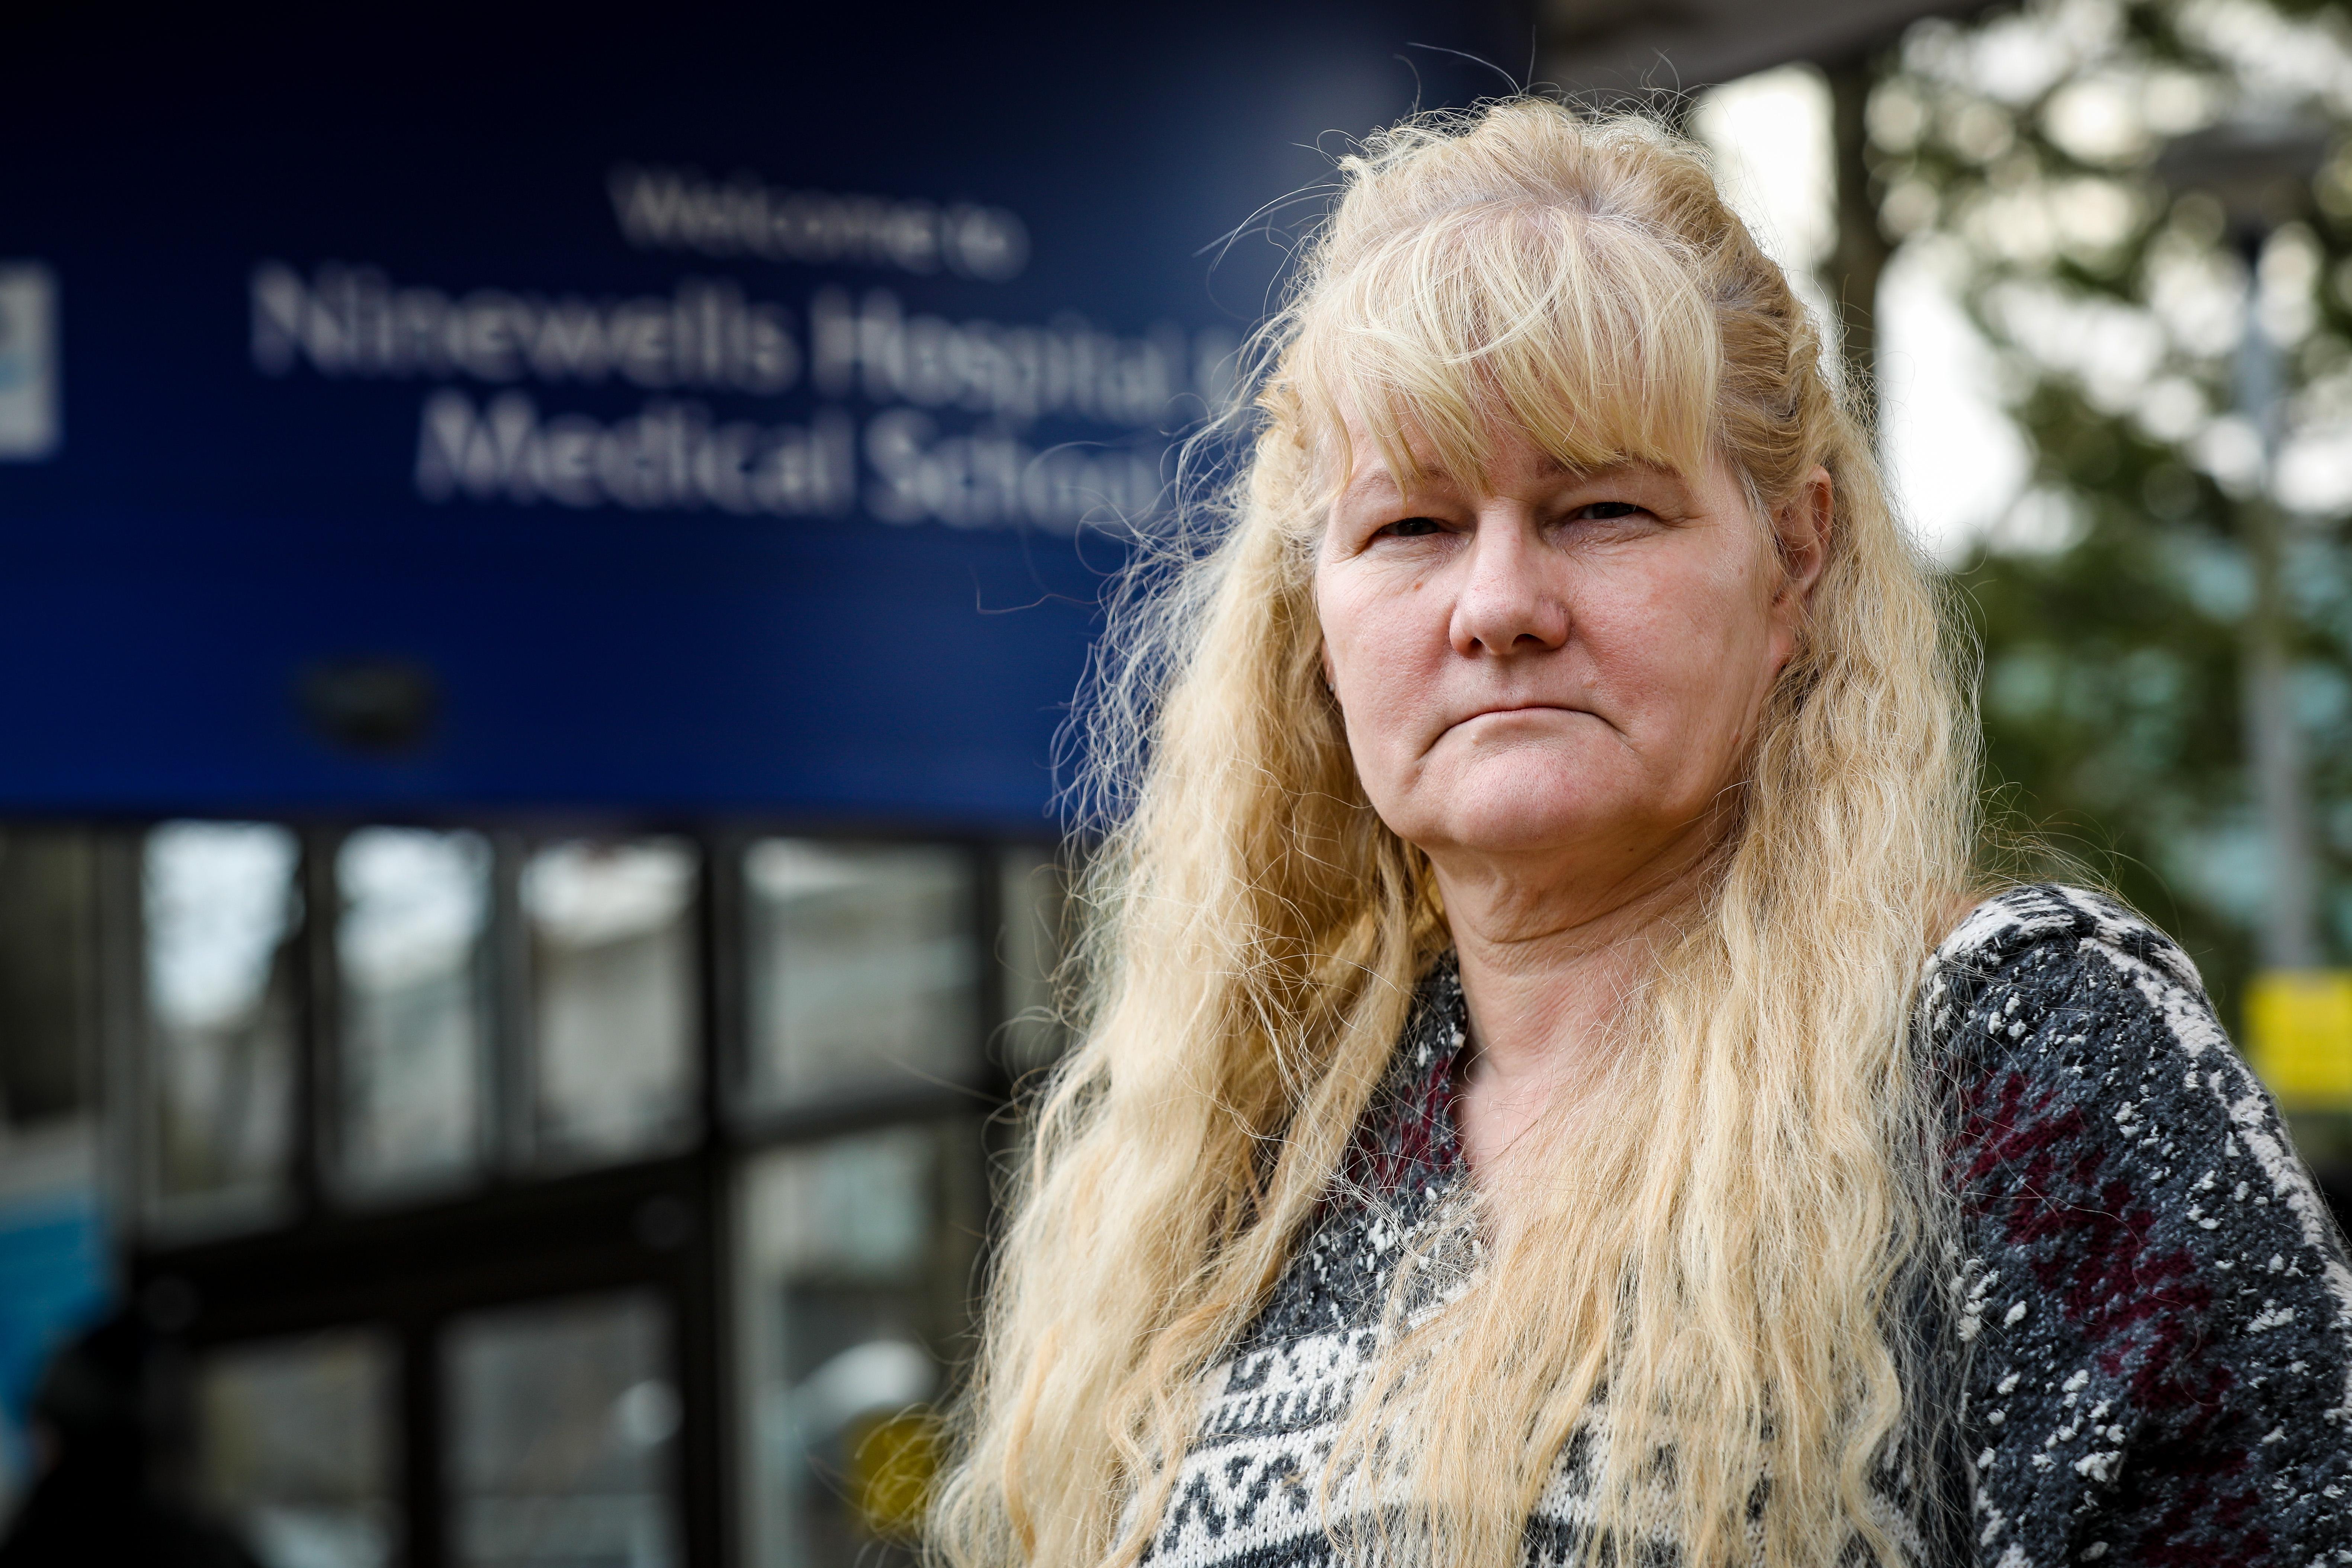 Angela Wright at Ninewells Hospital